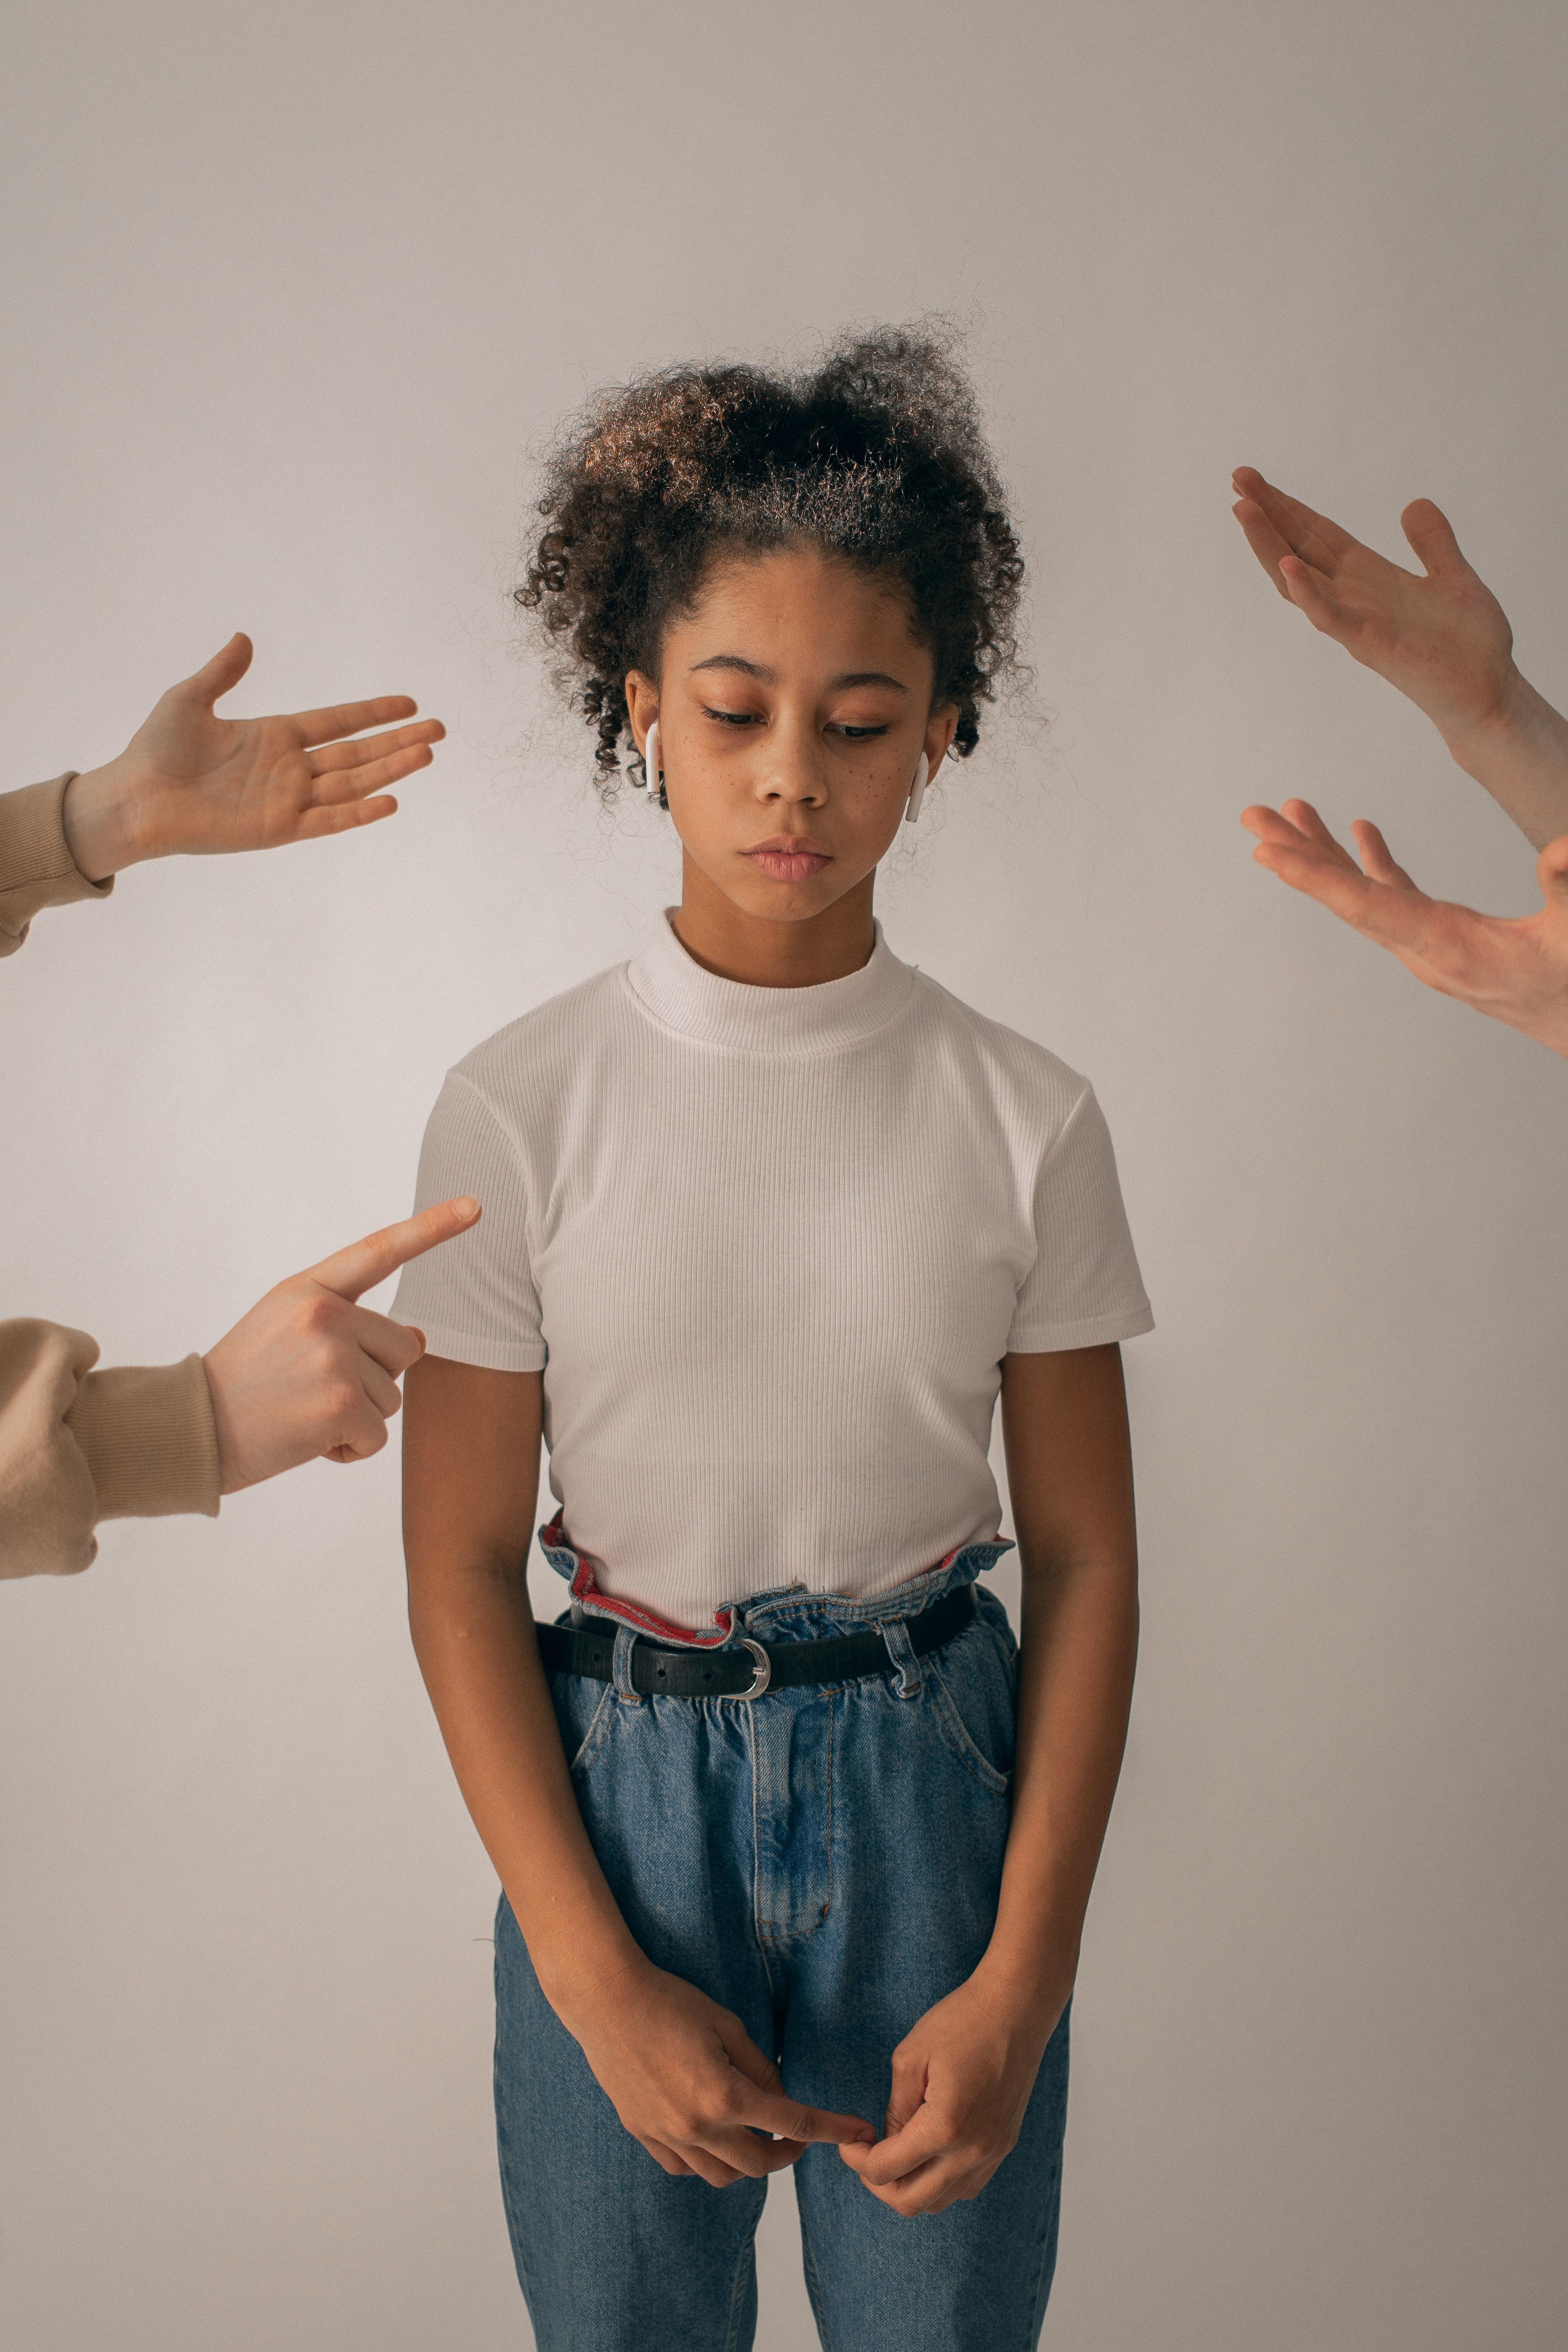 Child looking say between hands of arguing parents